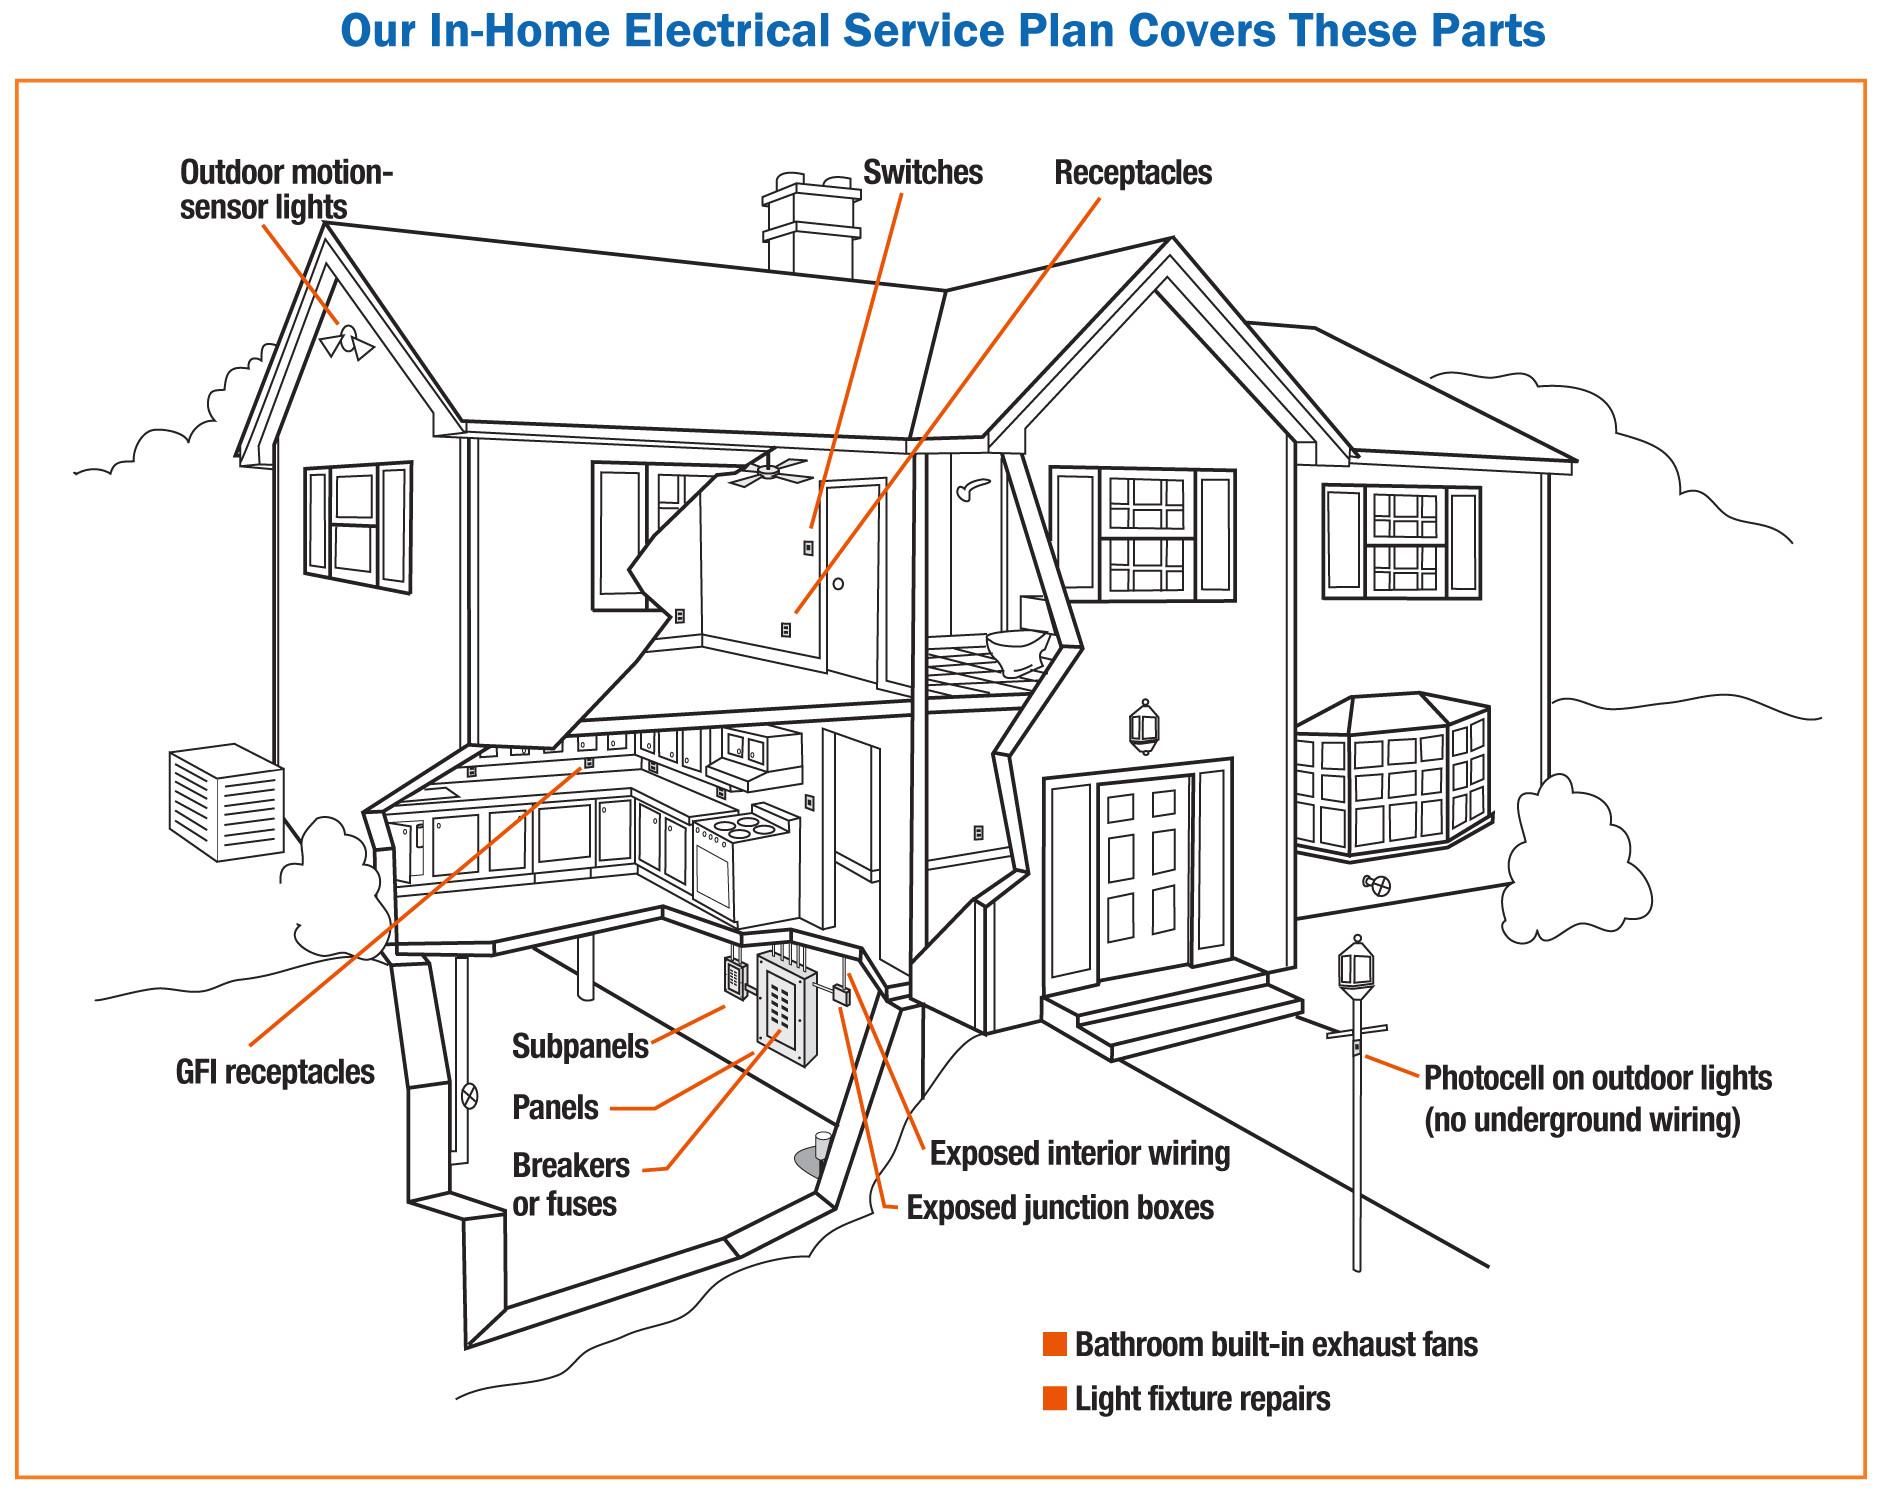 bge home service plans